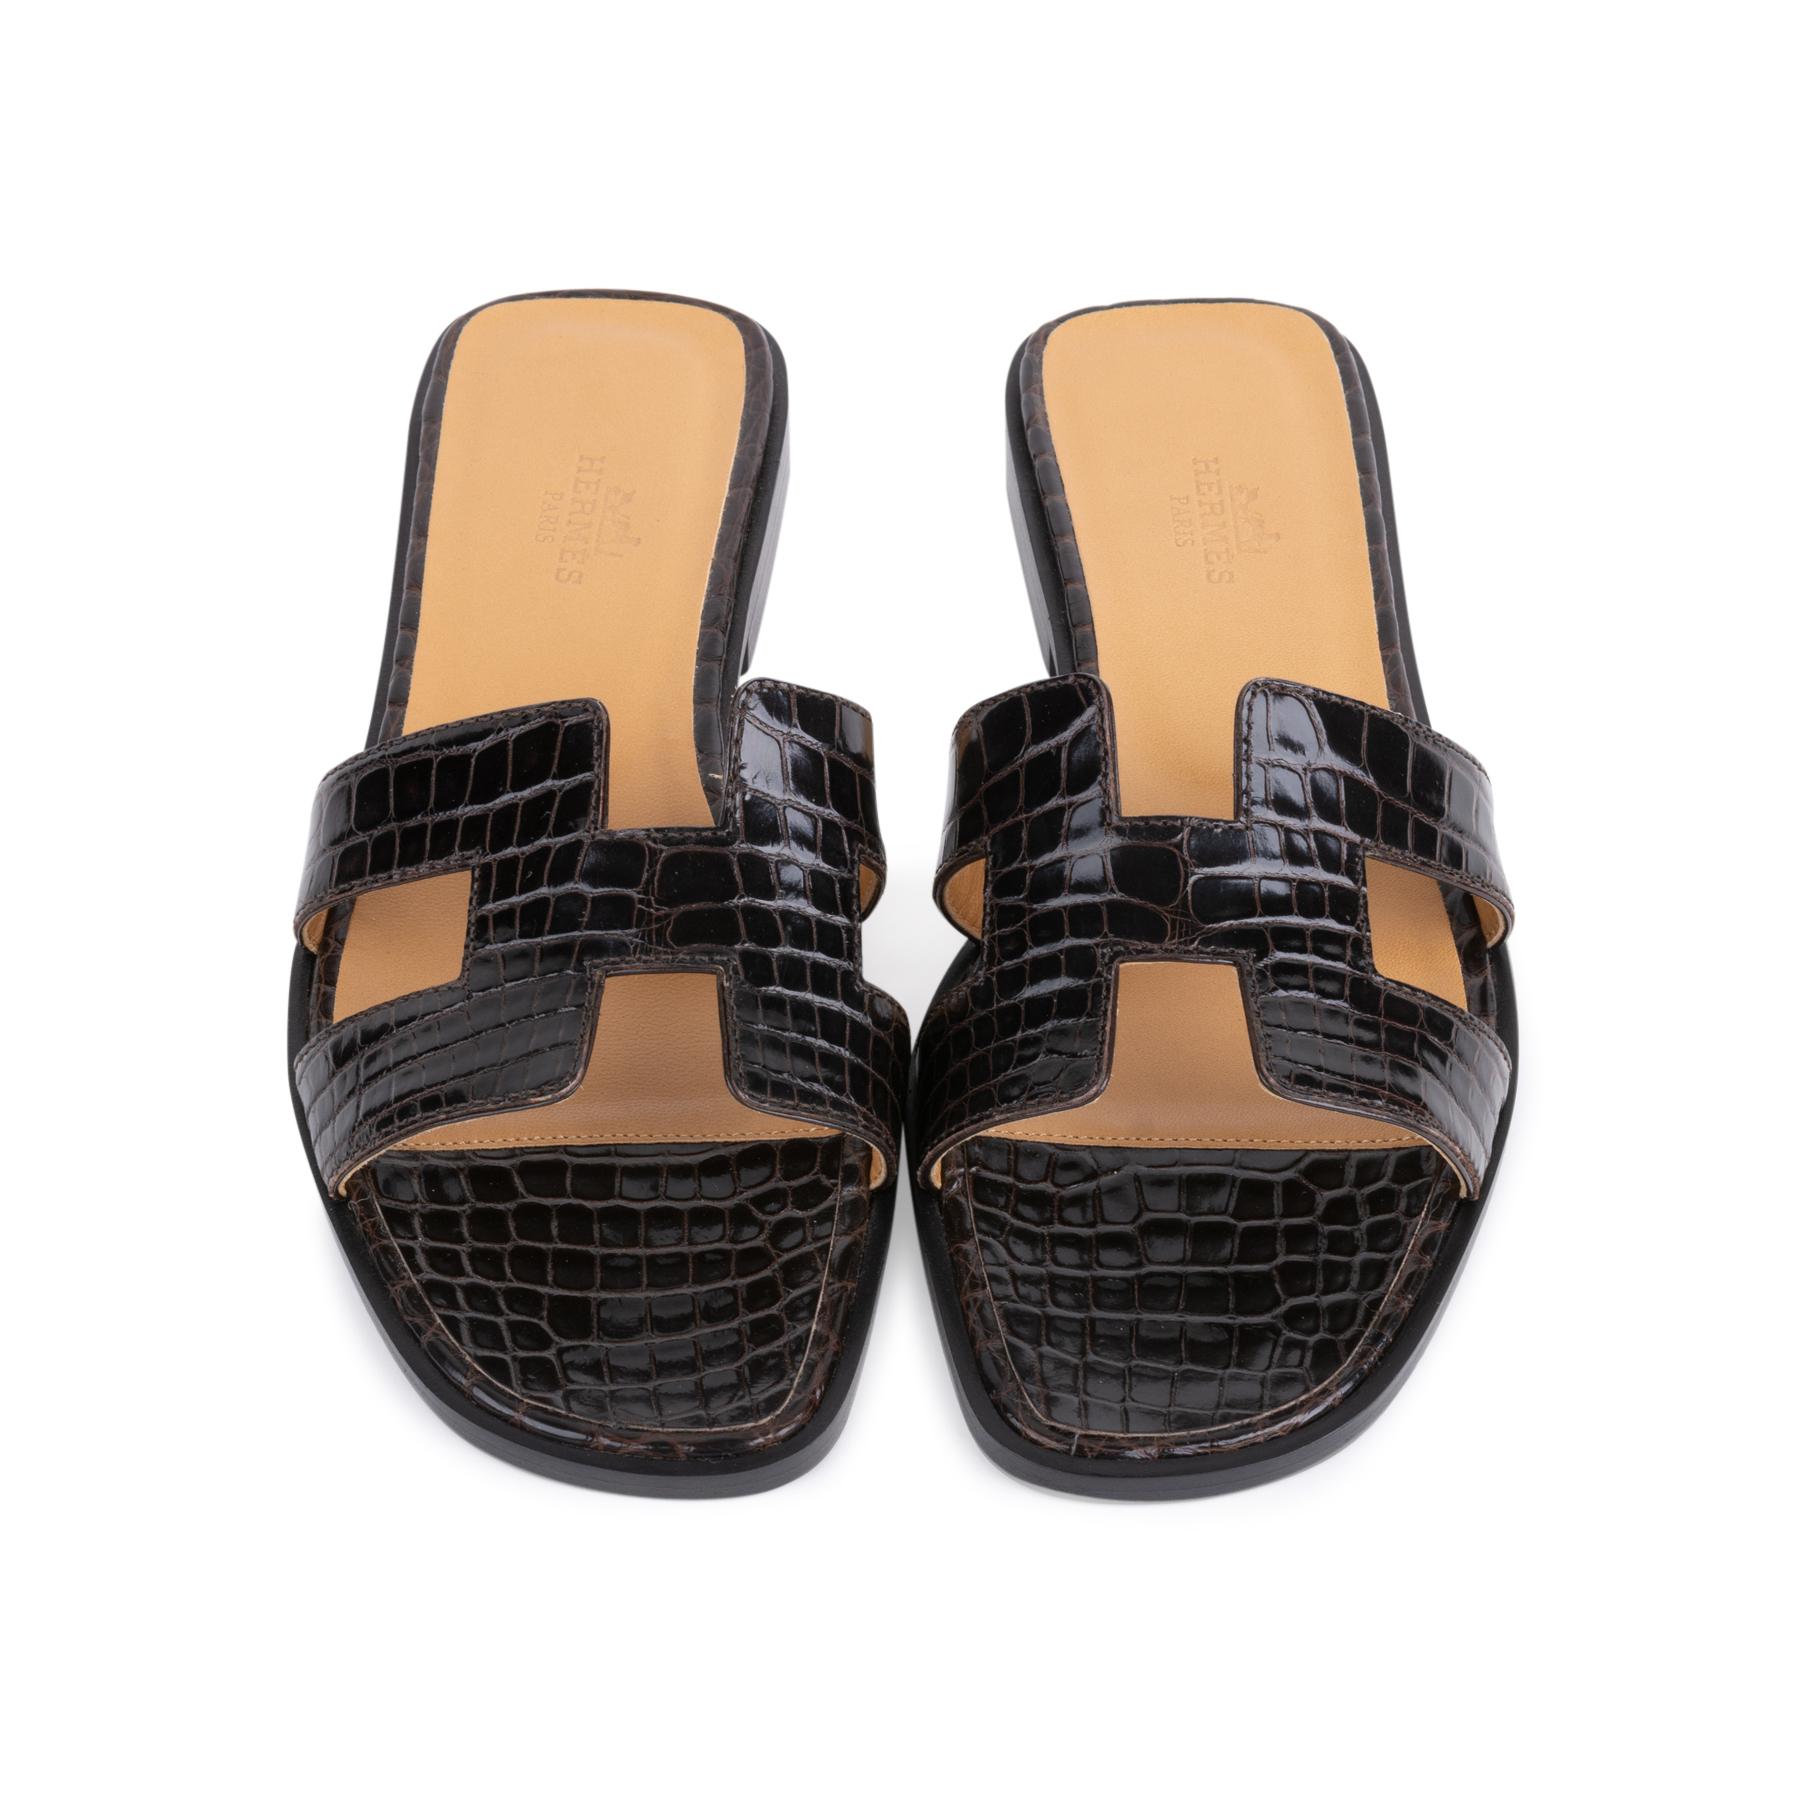 7bca5dfb64f Authentic Second Hand Hermès Crocodile Oran Sandals (PSS-145-00266 ...